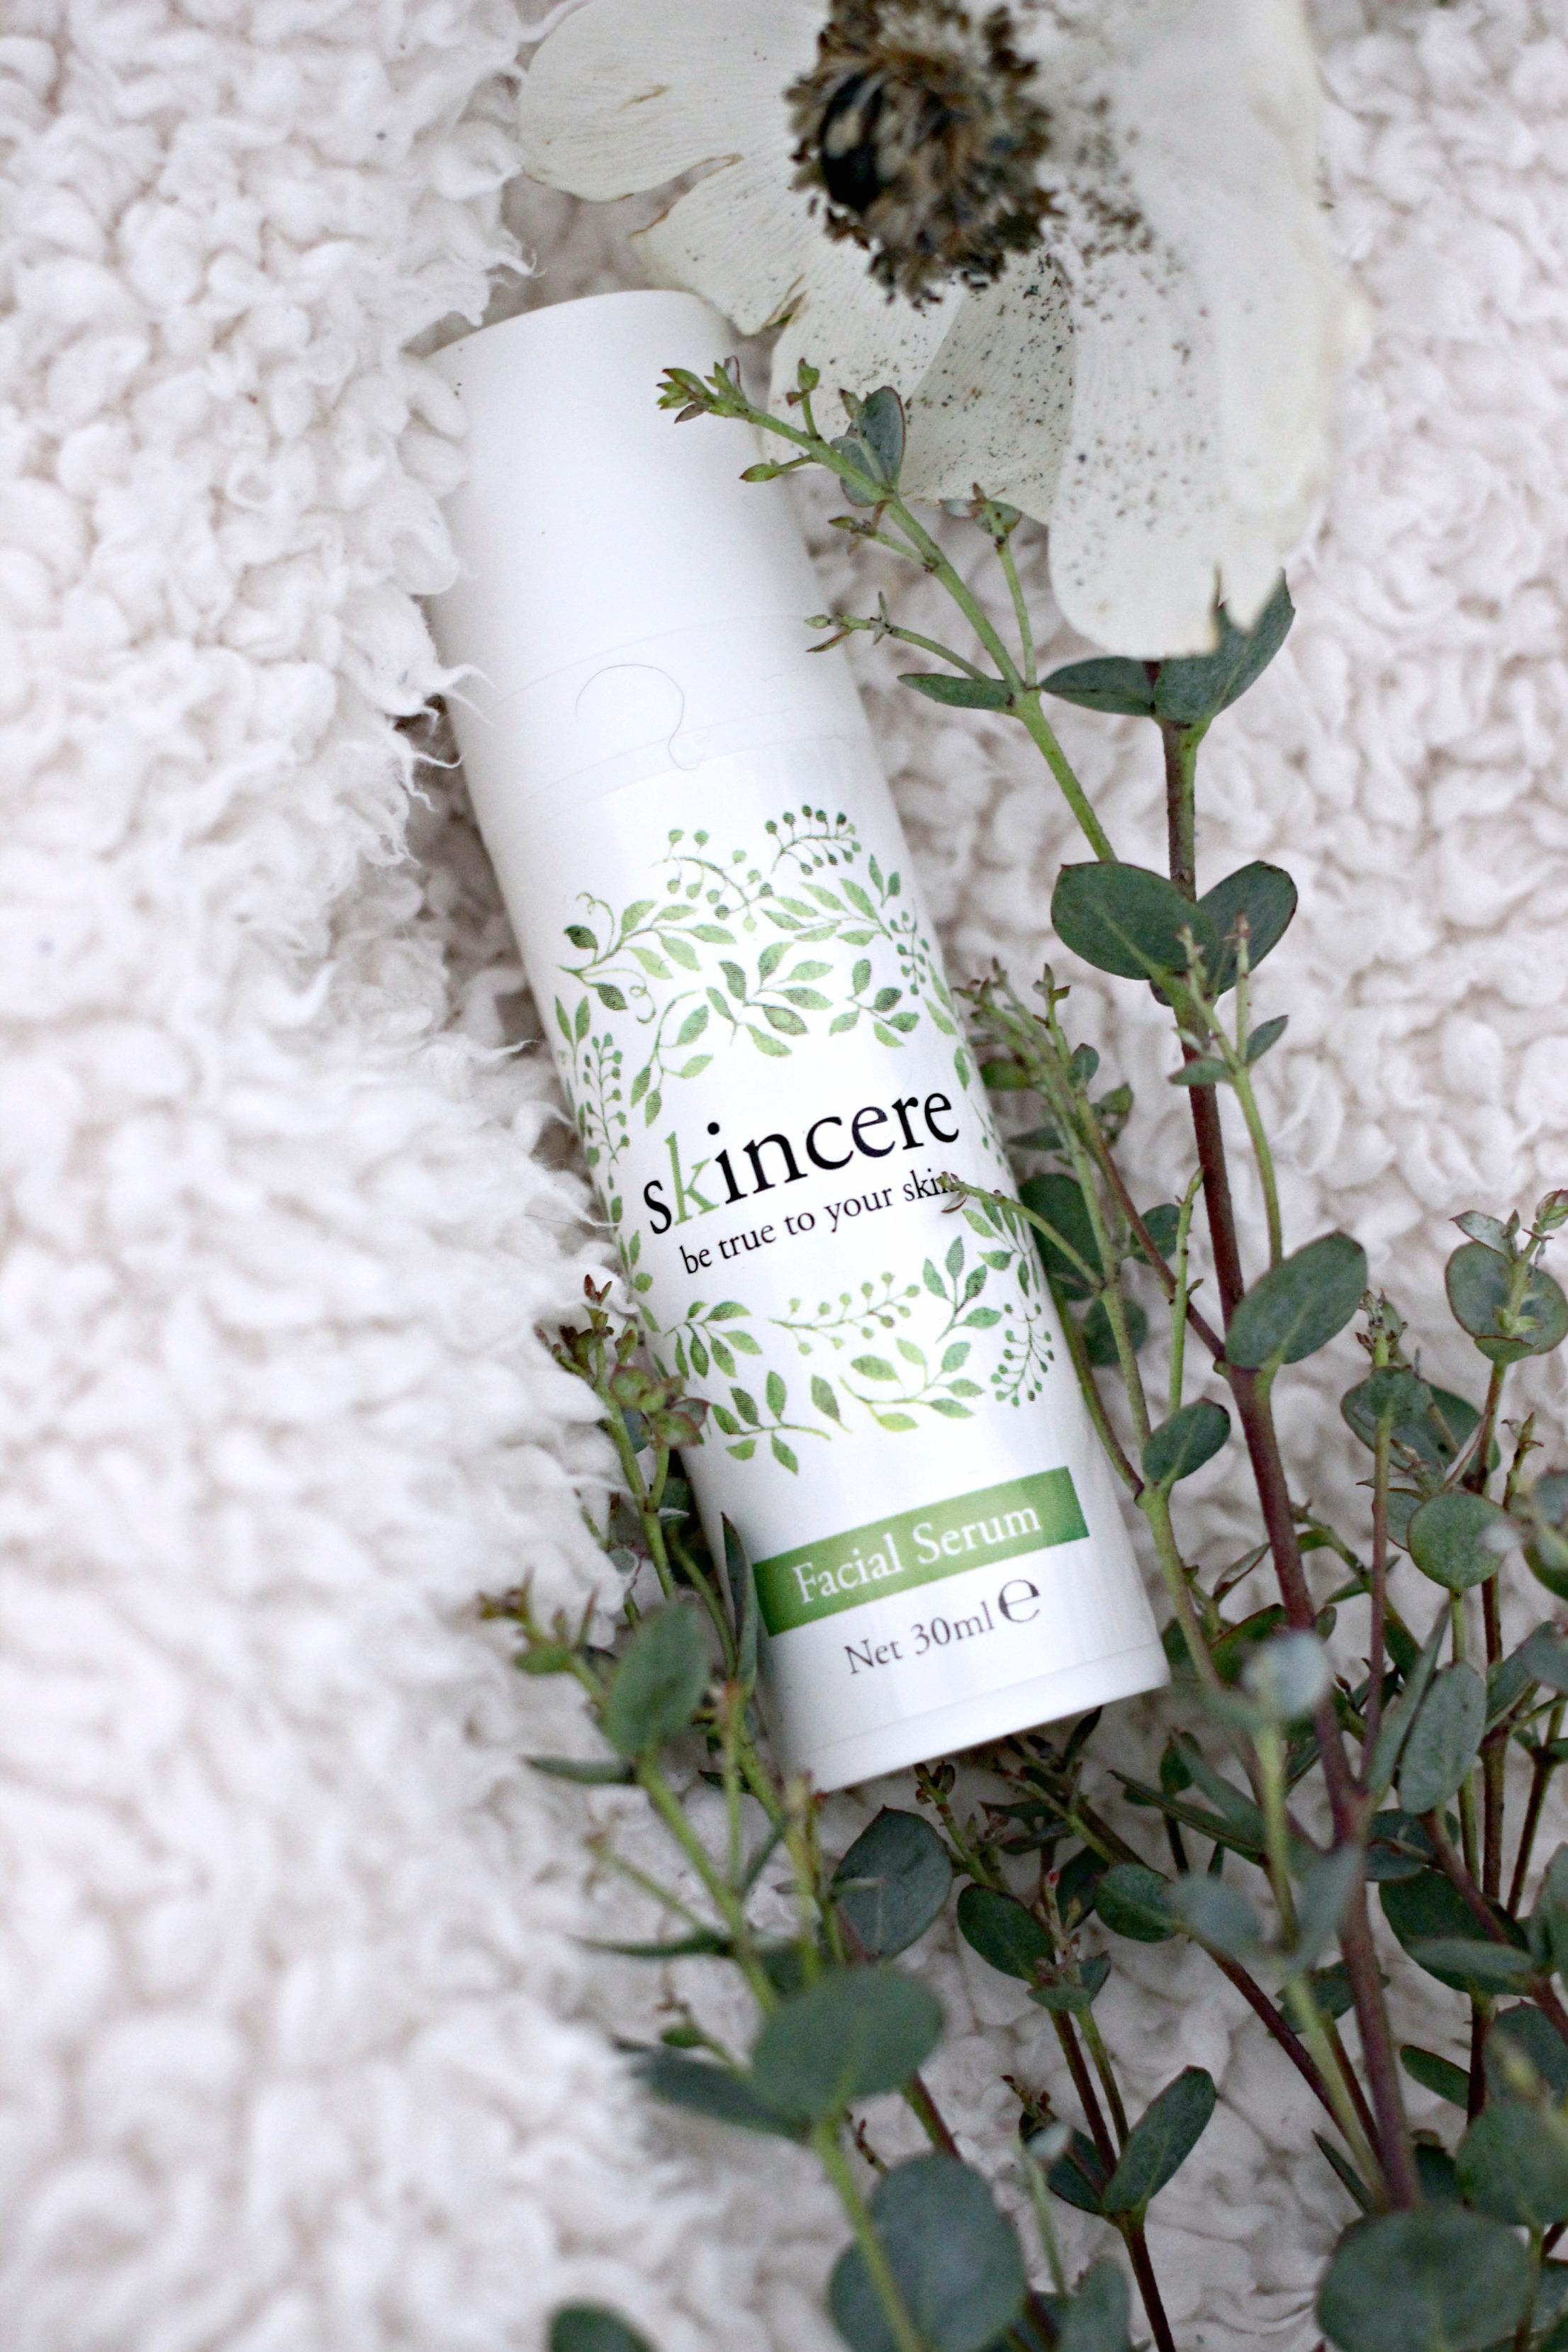 Skincare Natural Skincare Organic Beauty Review facial serum